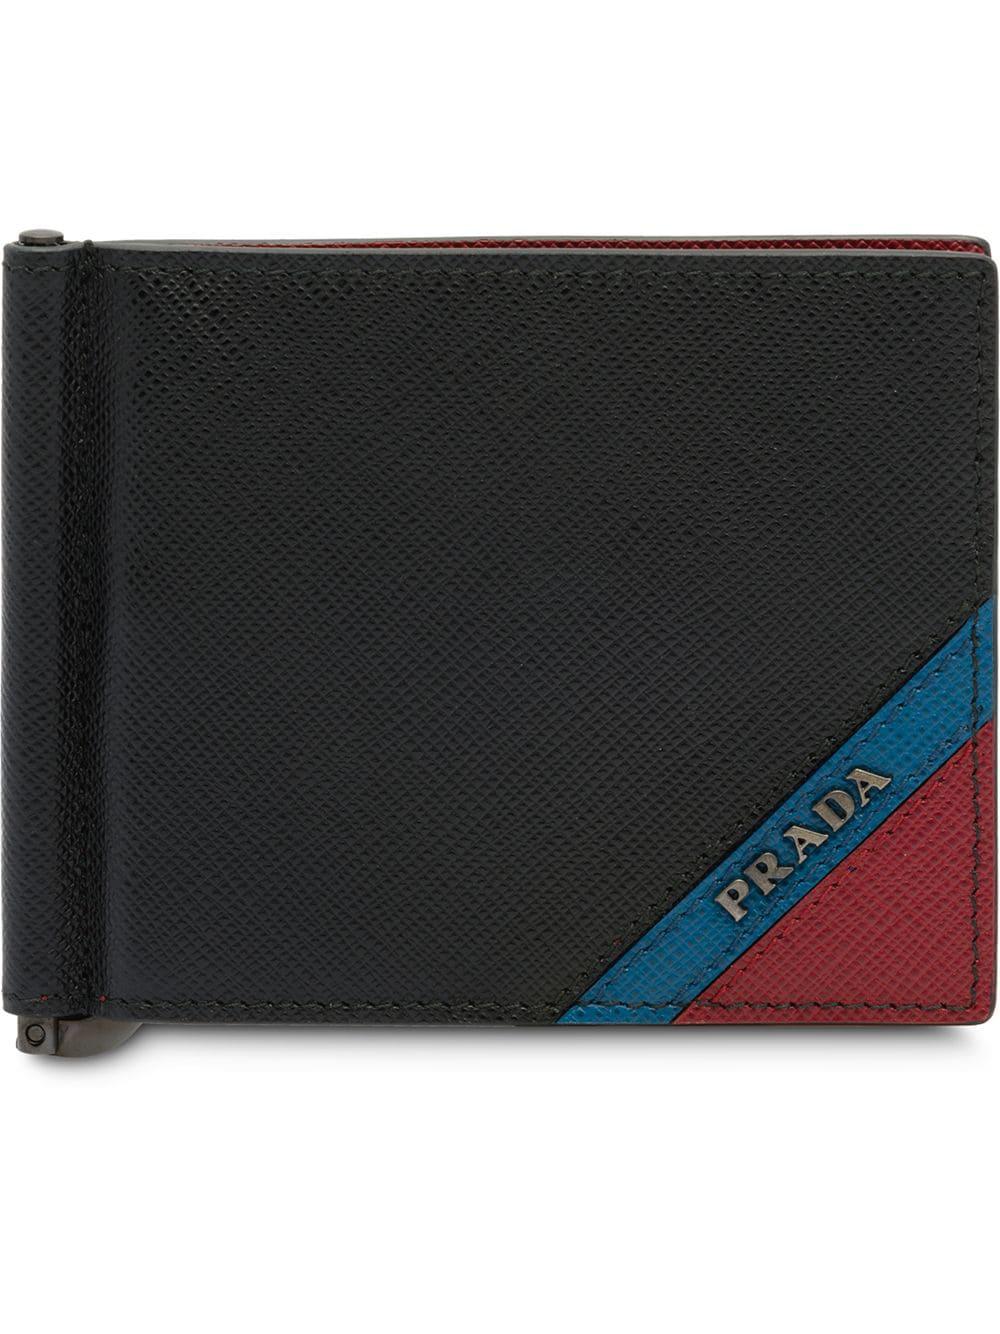 5deedb7bd970 Prada Saffiano Leather Bifold Wallet - Black | ModeSens